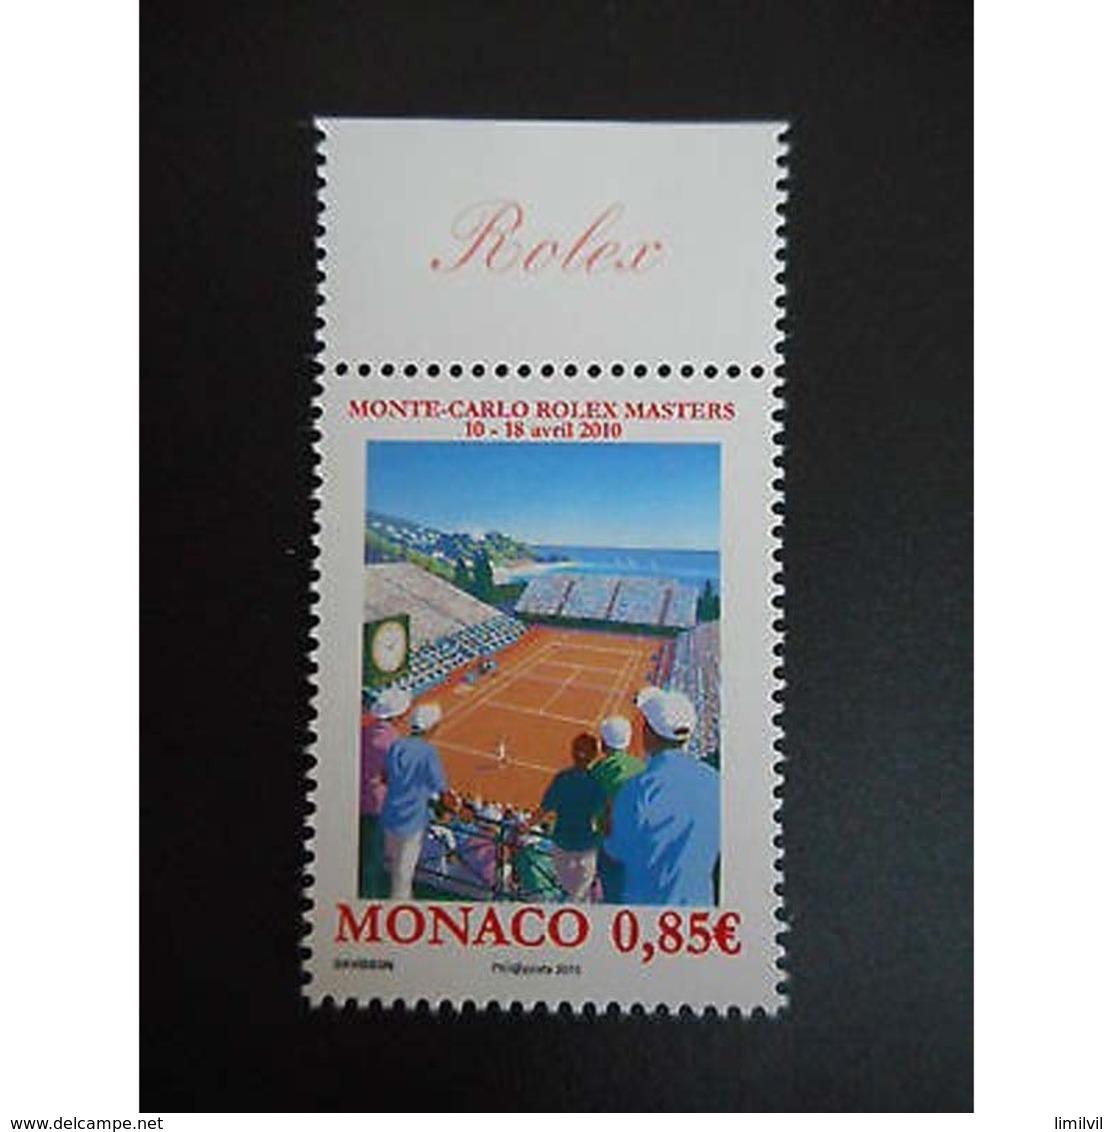 Timbre N° 2723 Neuf ** - Tournoi De Tennis Monte Carlo Rolex Masters - Monaco